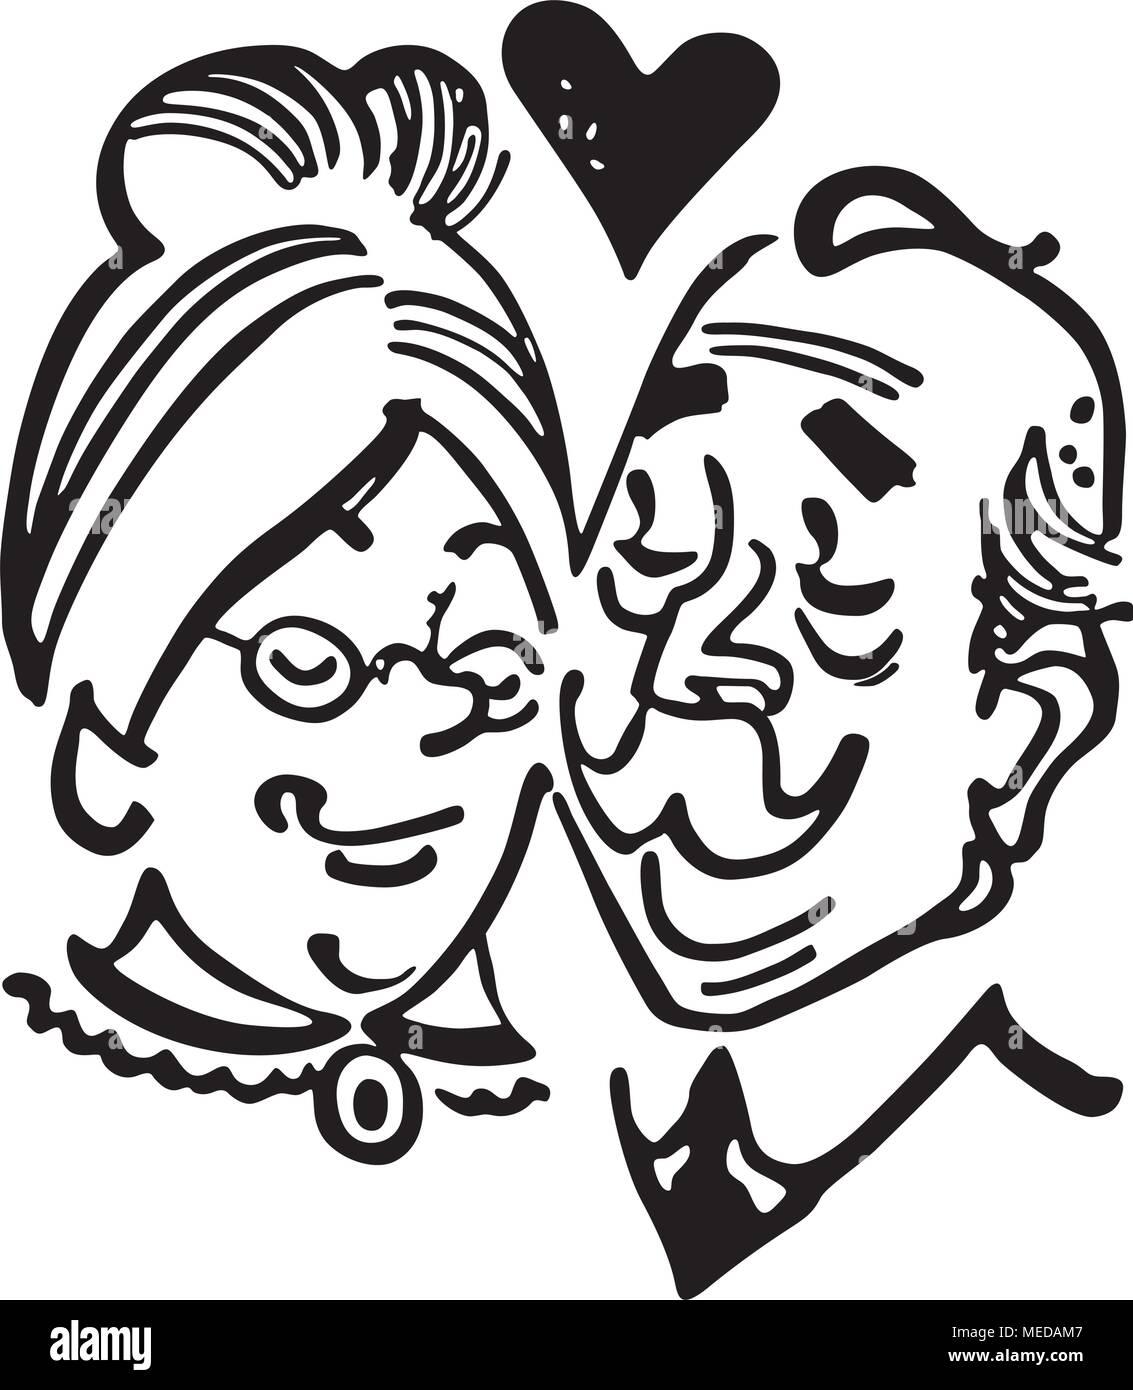 Elderly Couple In Love - Retro Clipart Illustration - Stock Vector